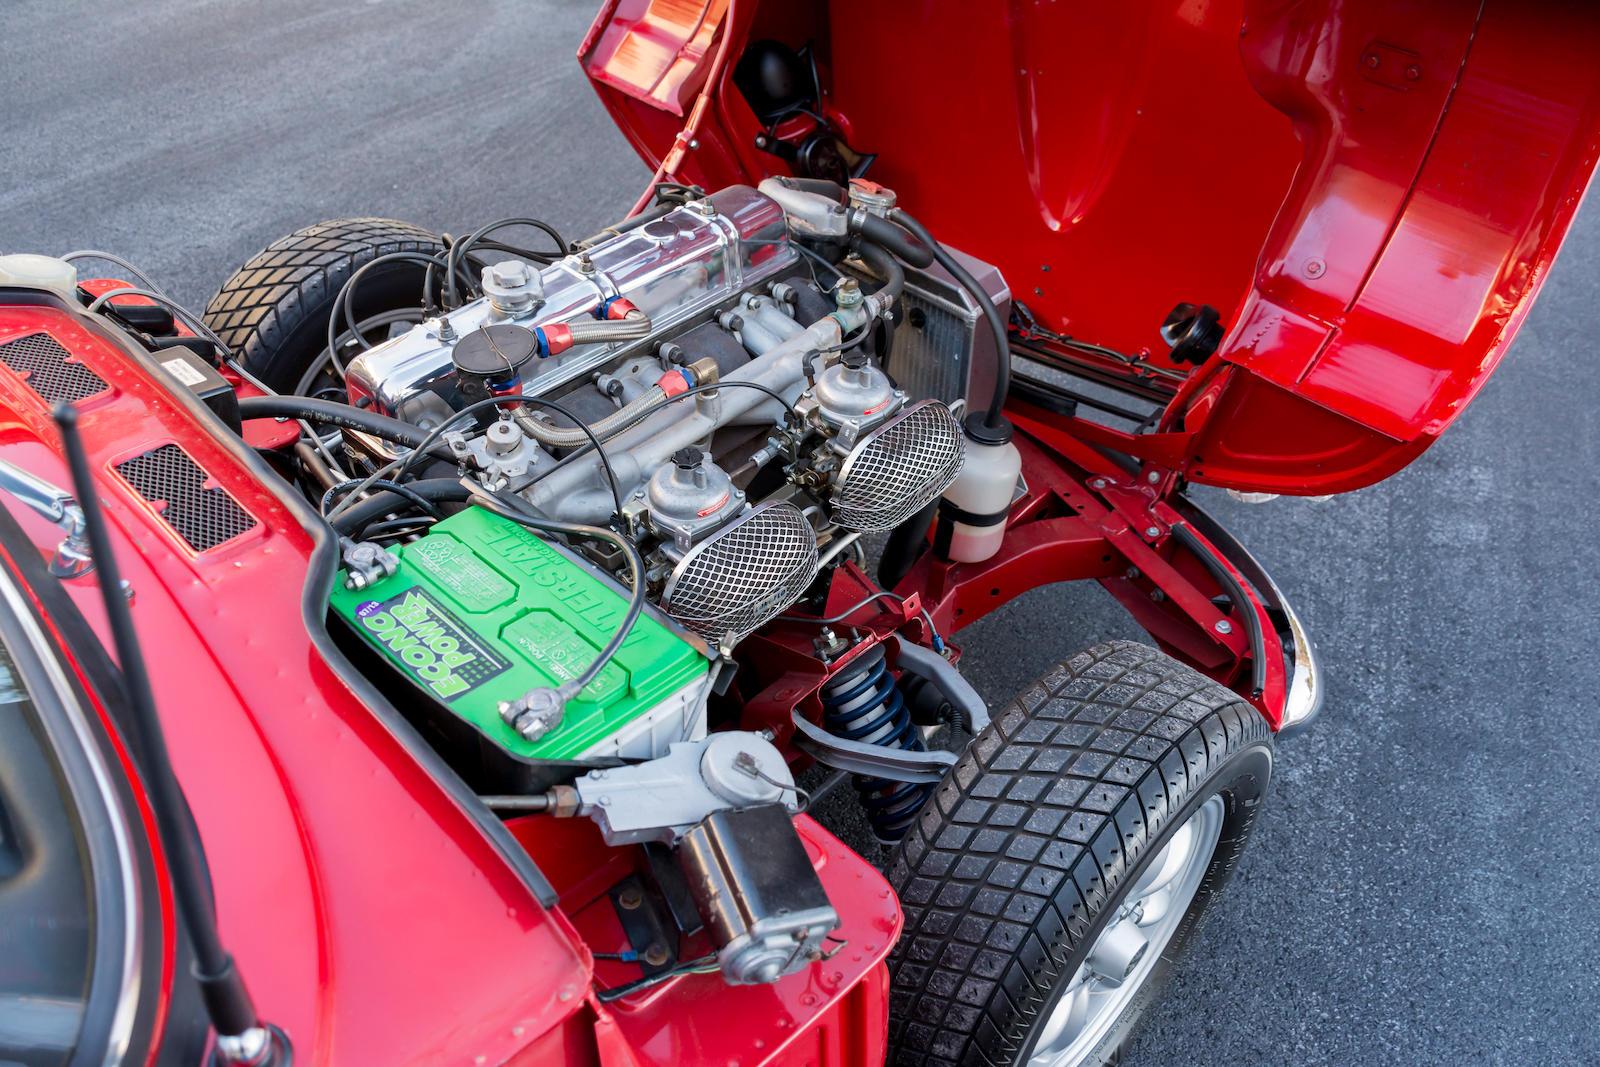 1967 Triumph GT6 Mk I Coupe engine